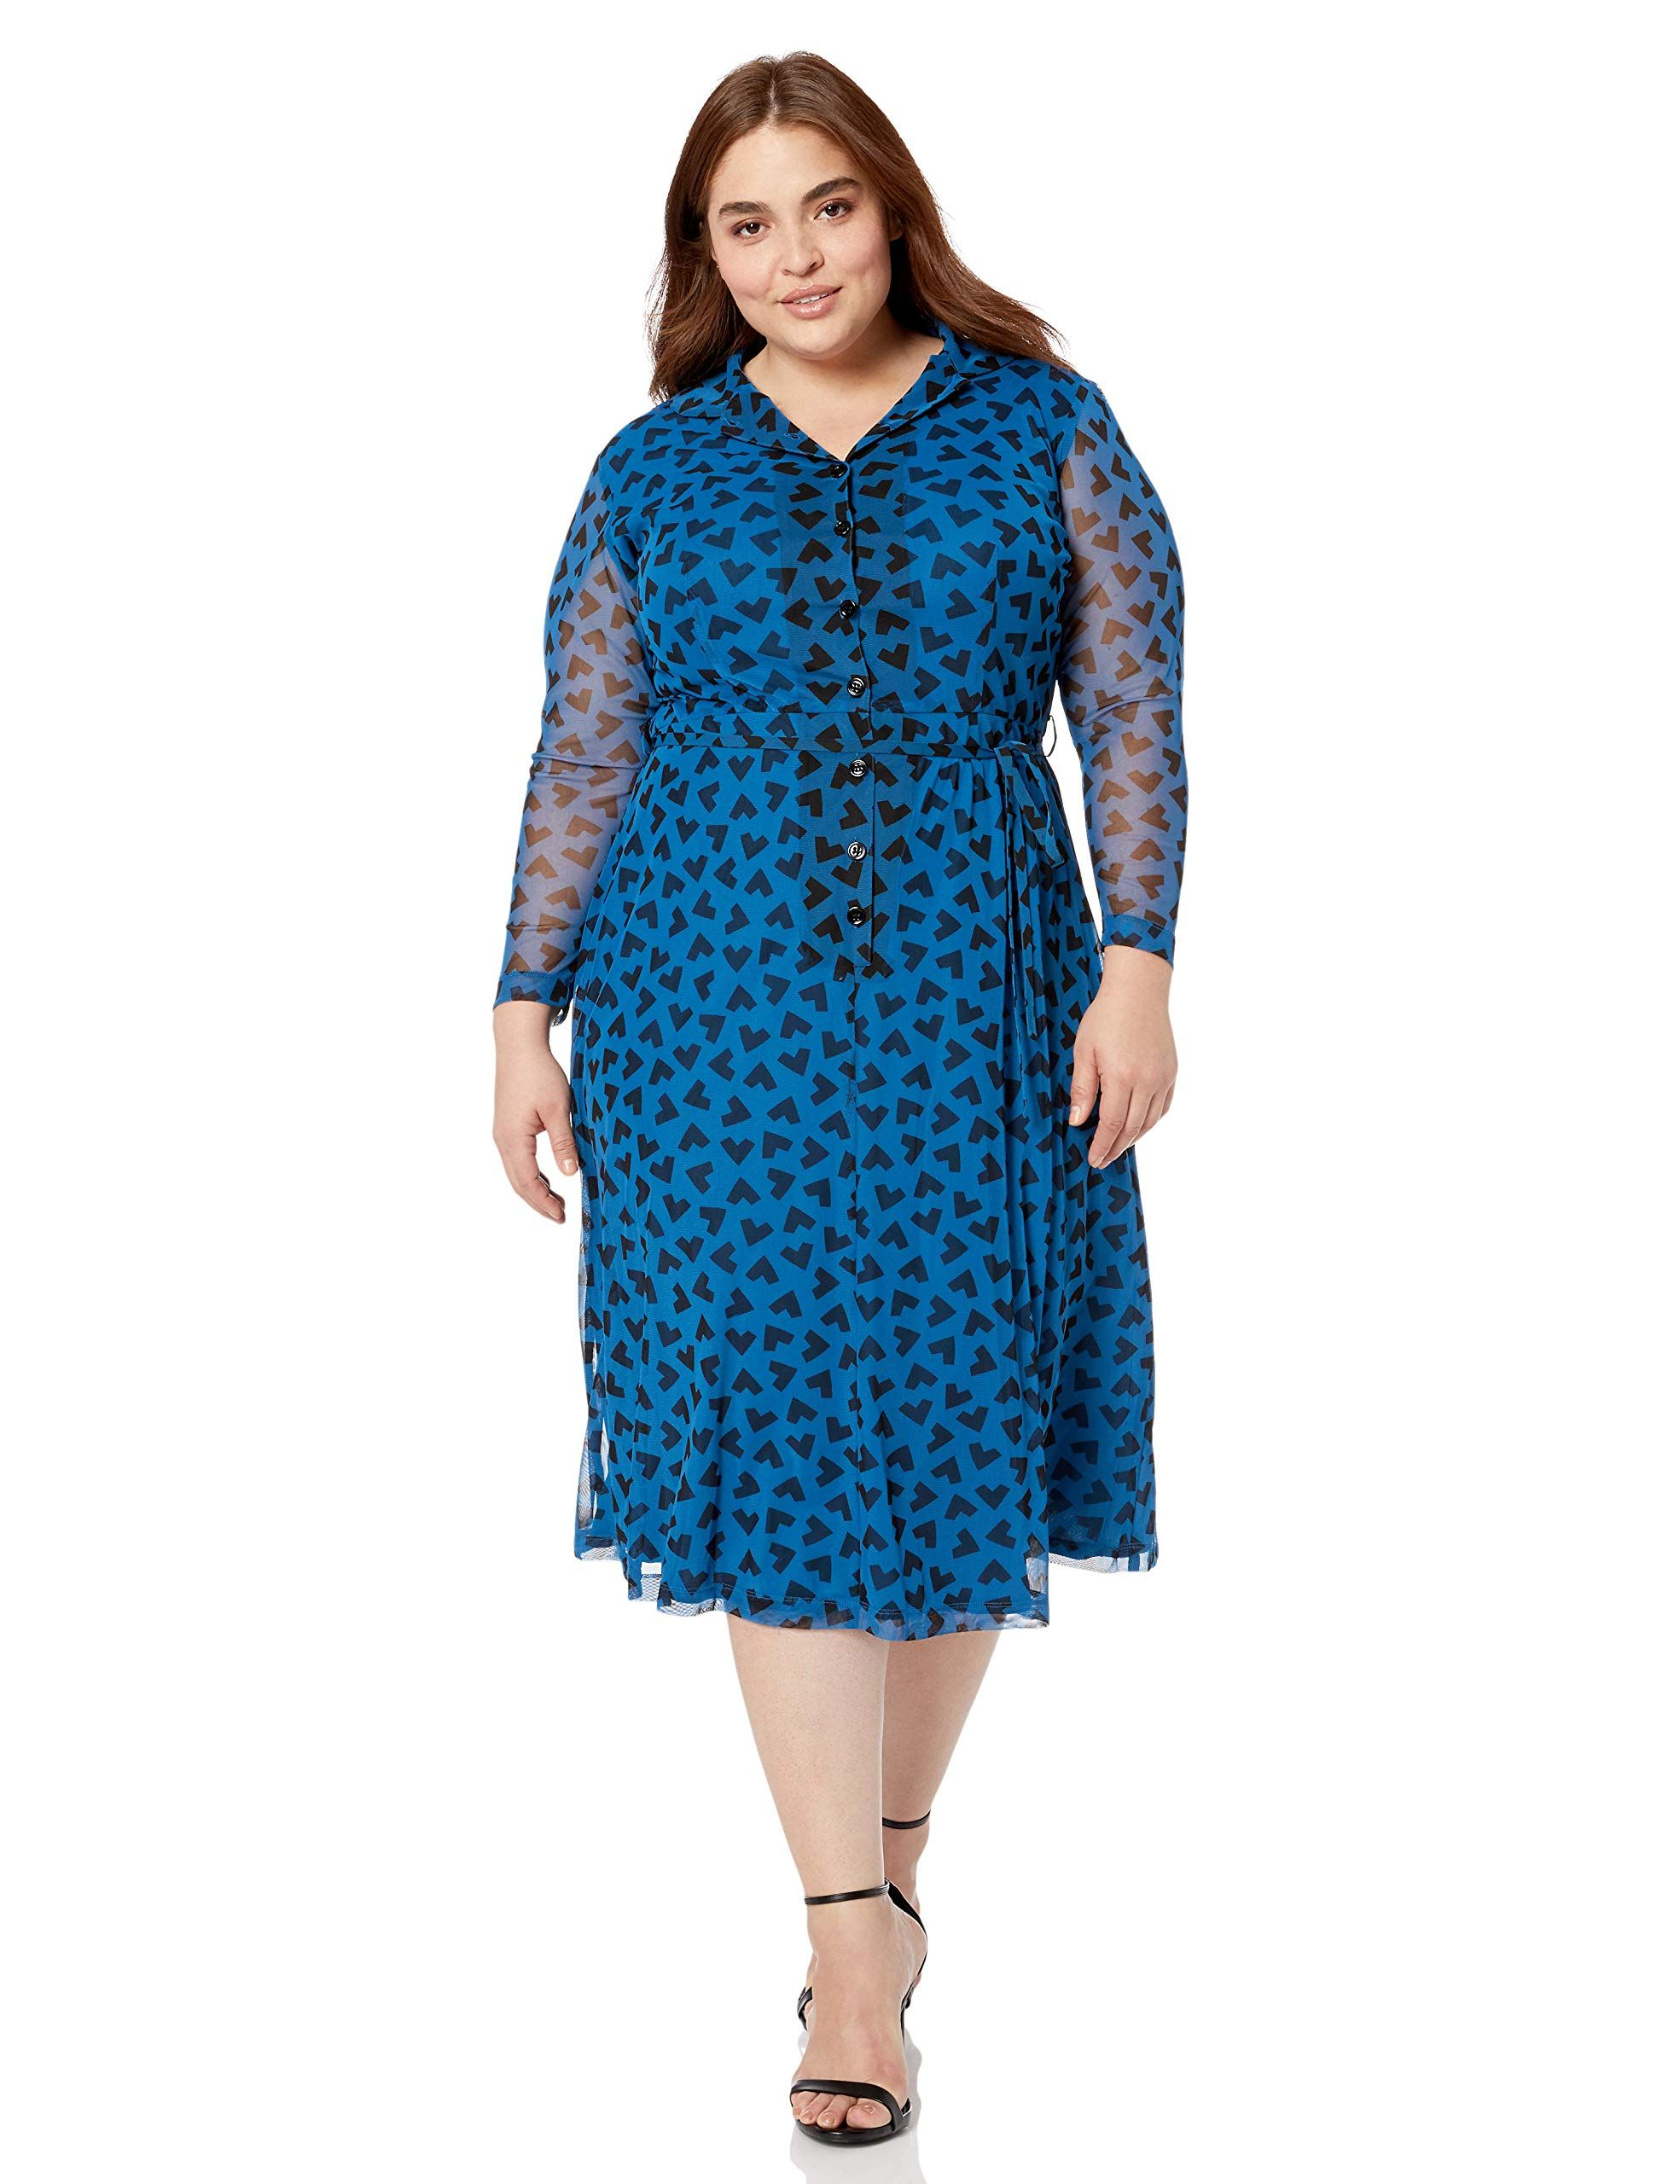 Anne Klein Women S Plus Long Sleeve Button Down Dress Sponsored Dresses Button Down Dress Plus Size Dresses [ 2560 x 1969 Pixel ]